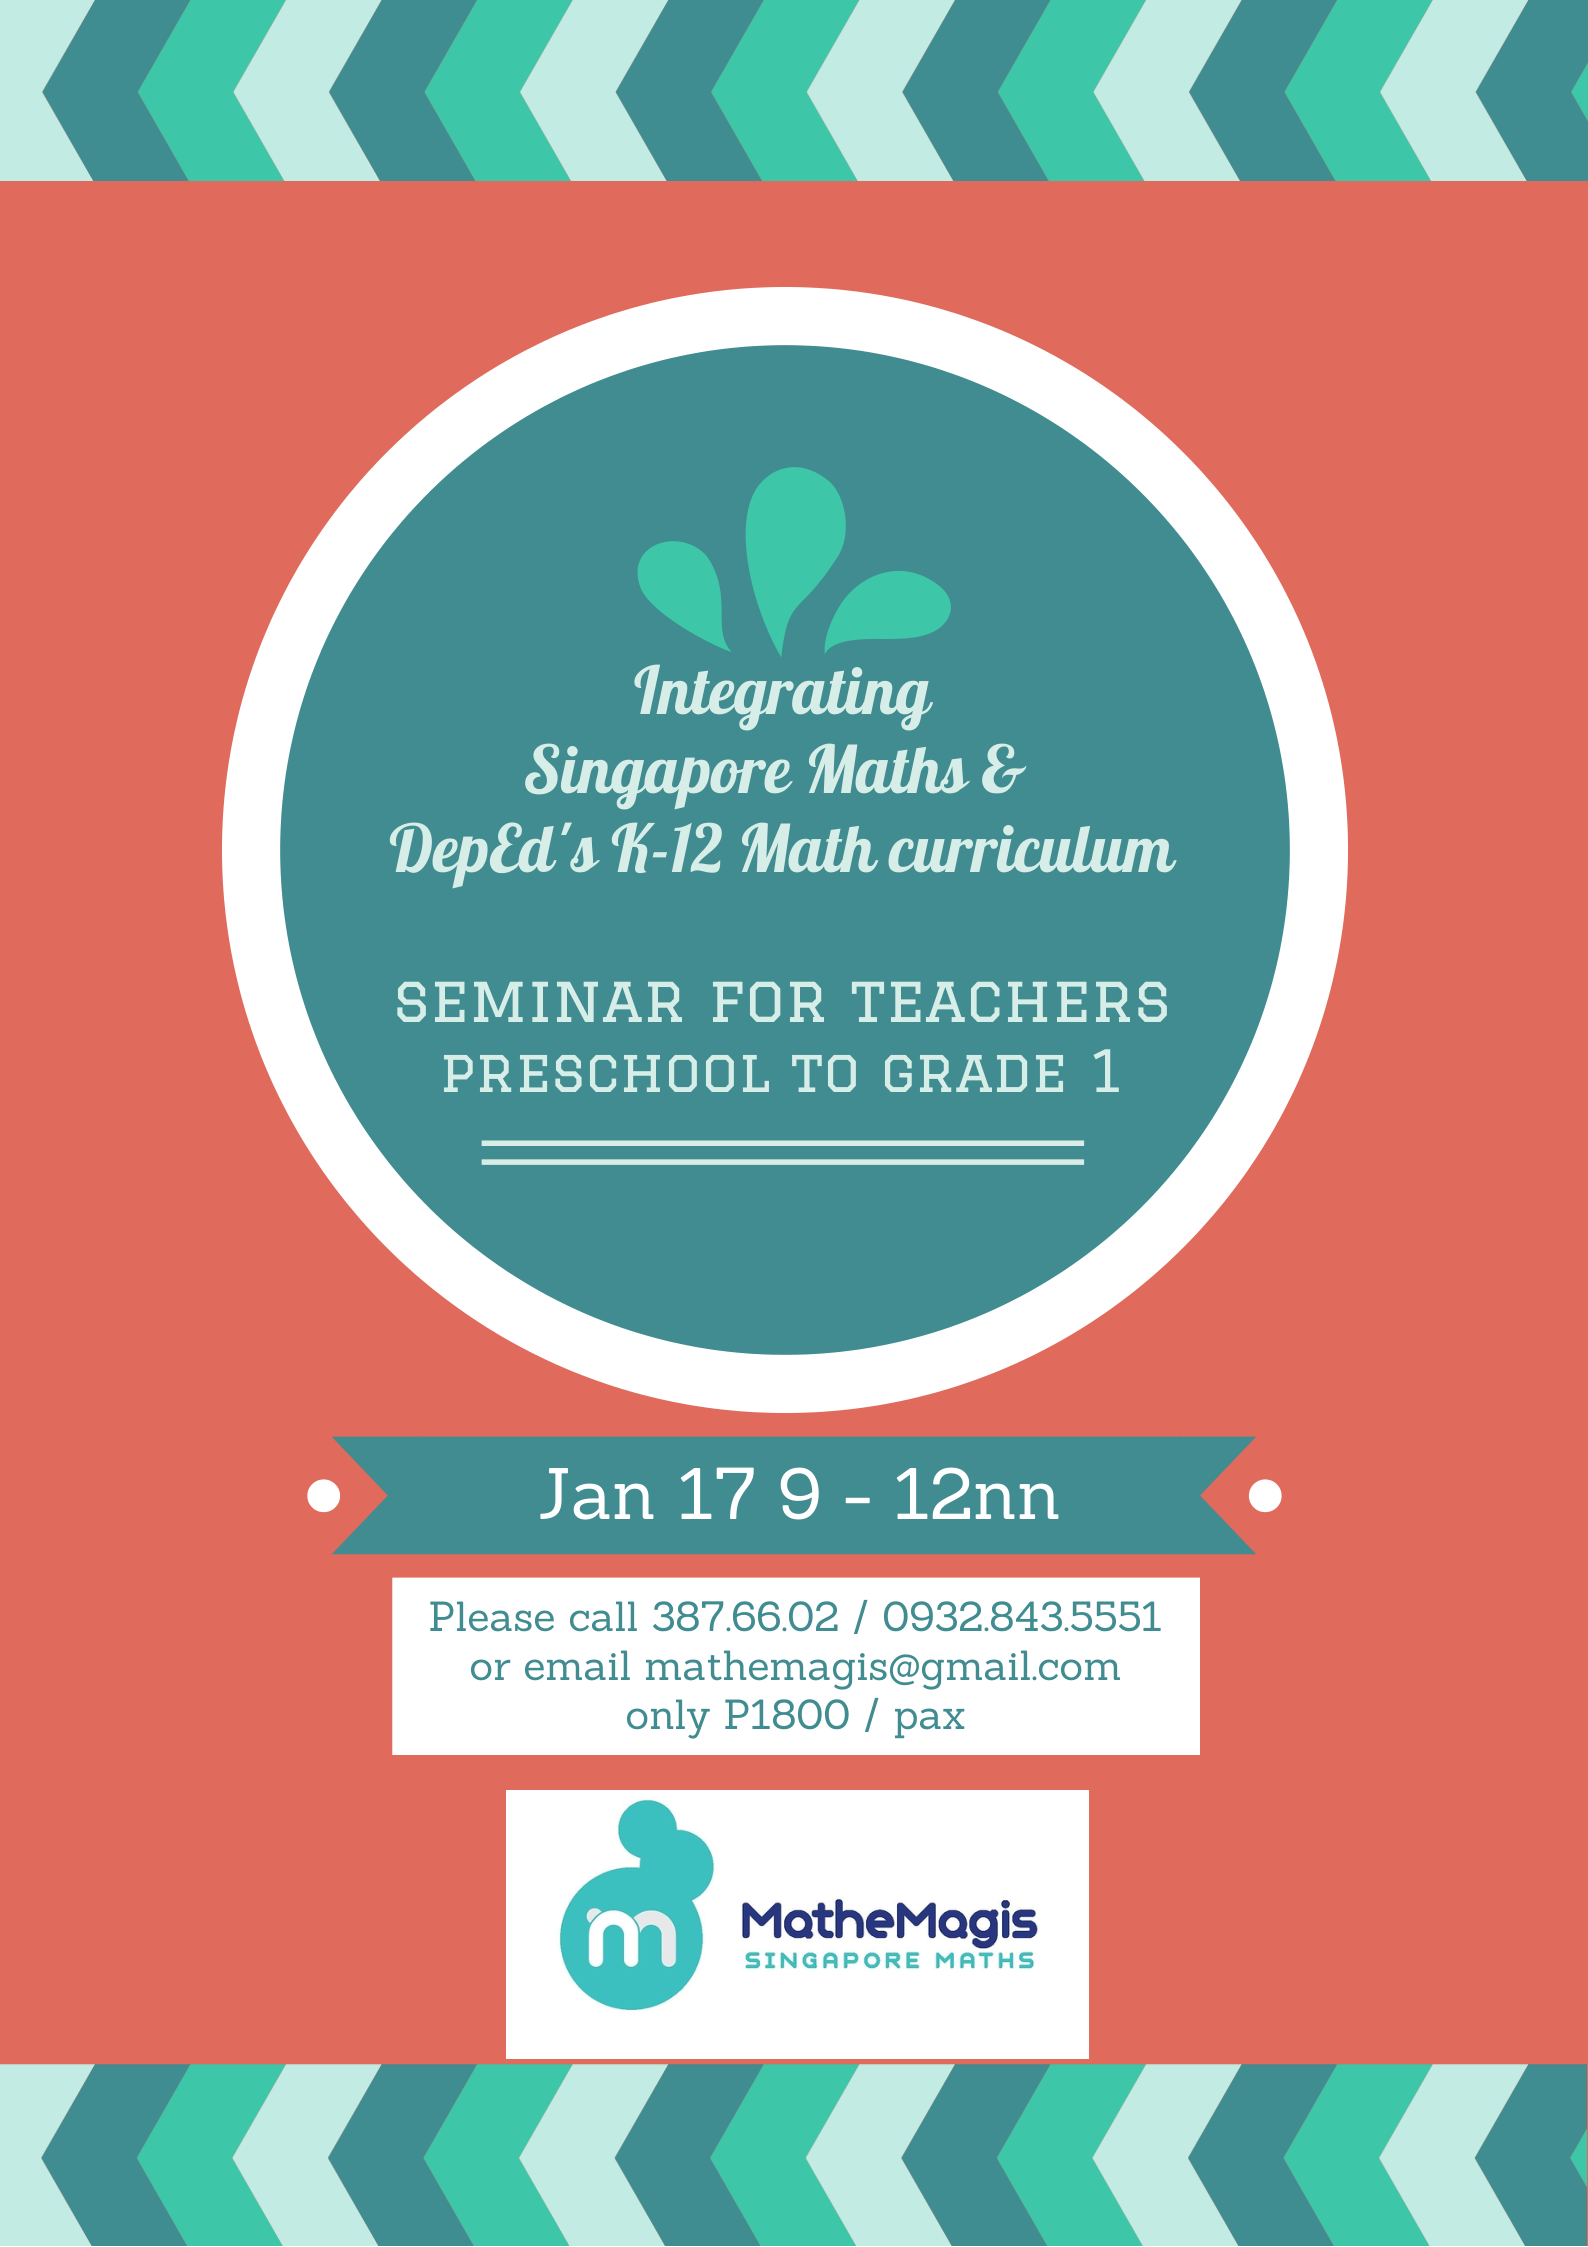 MatheMagis Singapore Maths » Blog Archive » Seminar for preschool ...